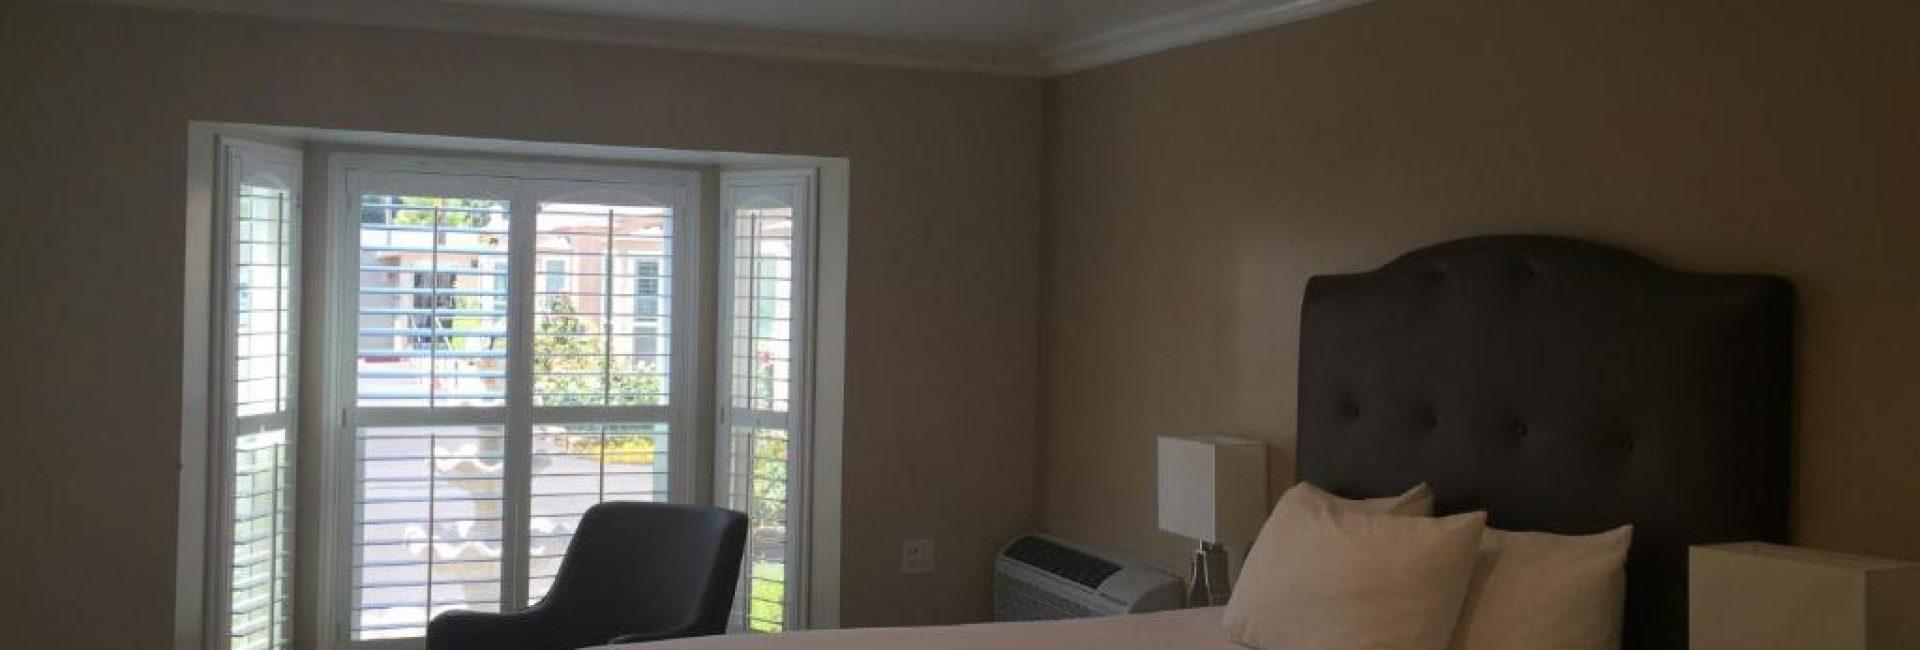 Deluxe Single Room